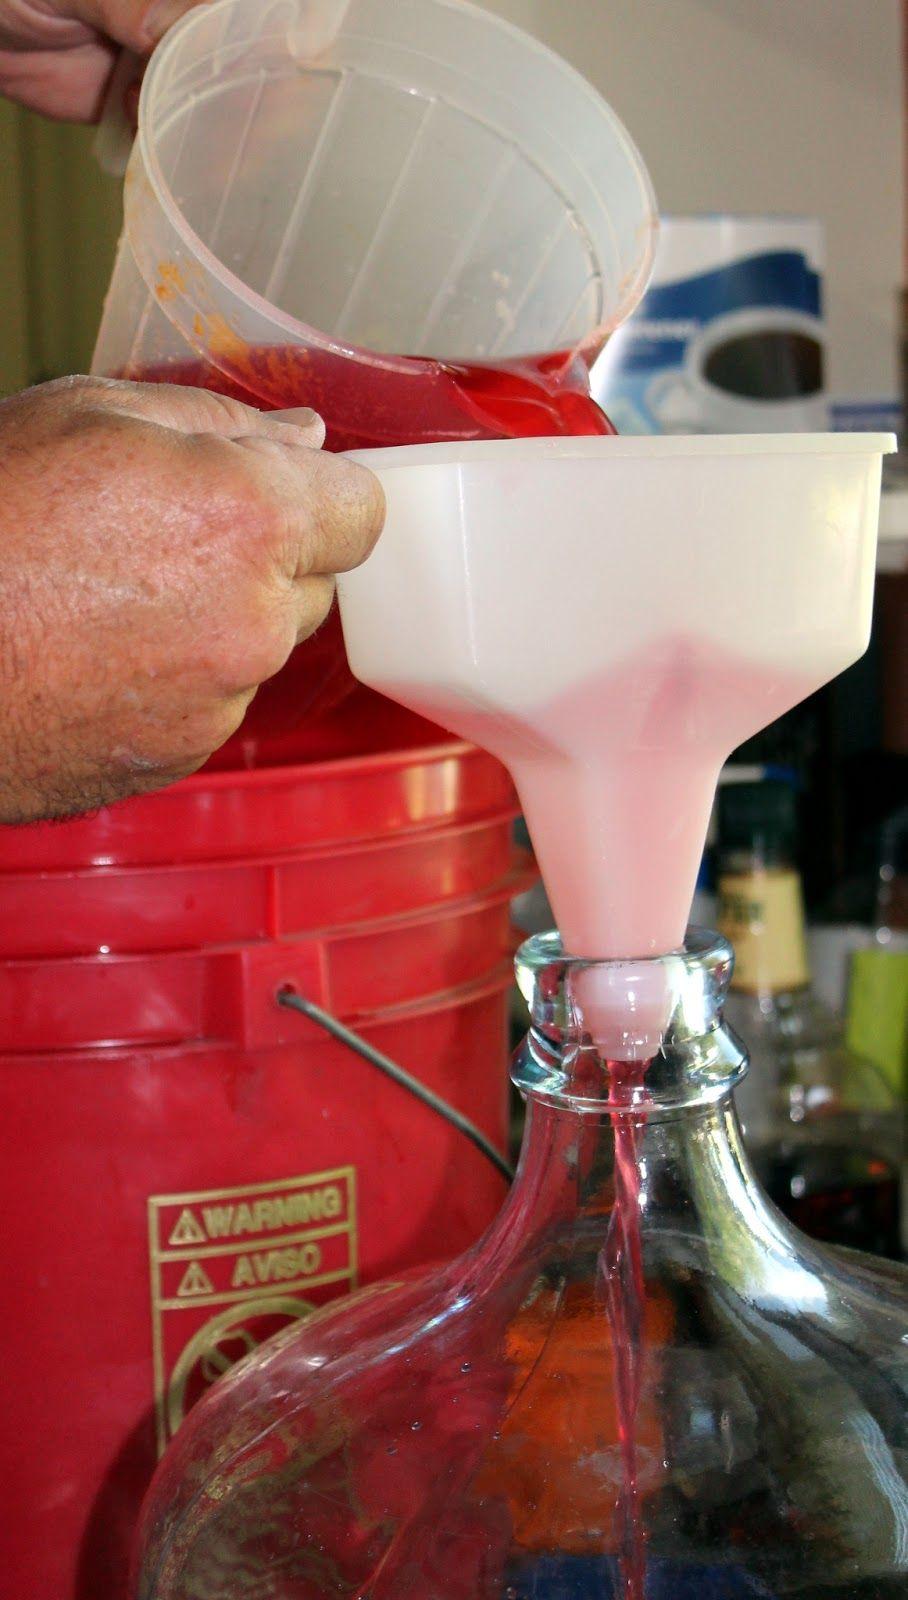 Homemade Cherry Wine With Images Cherry Wine Homemade Wine Recipes Wine Making Recipes